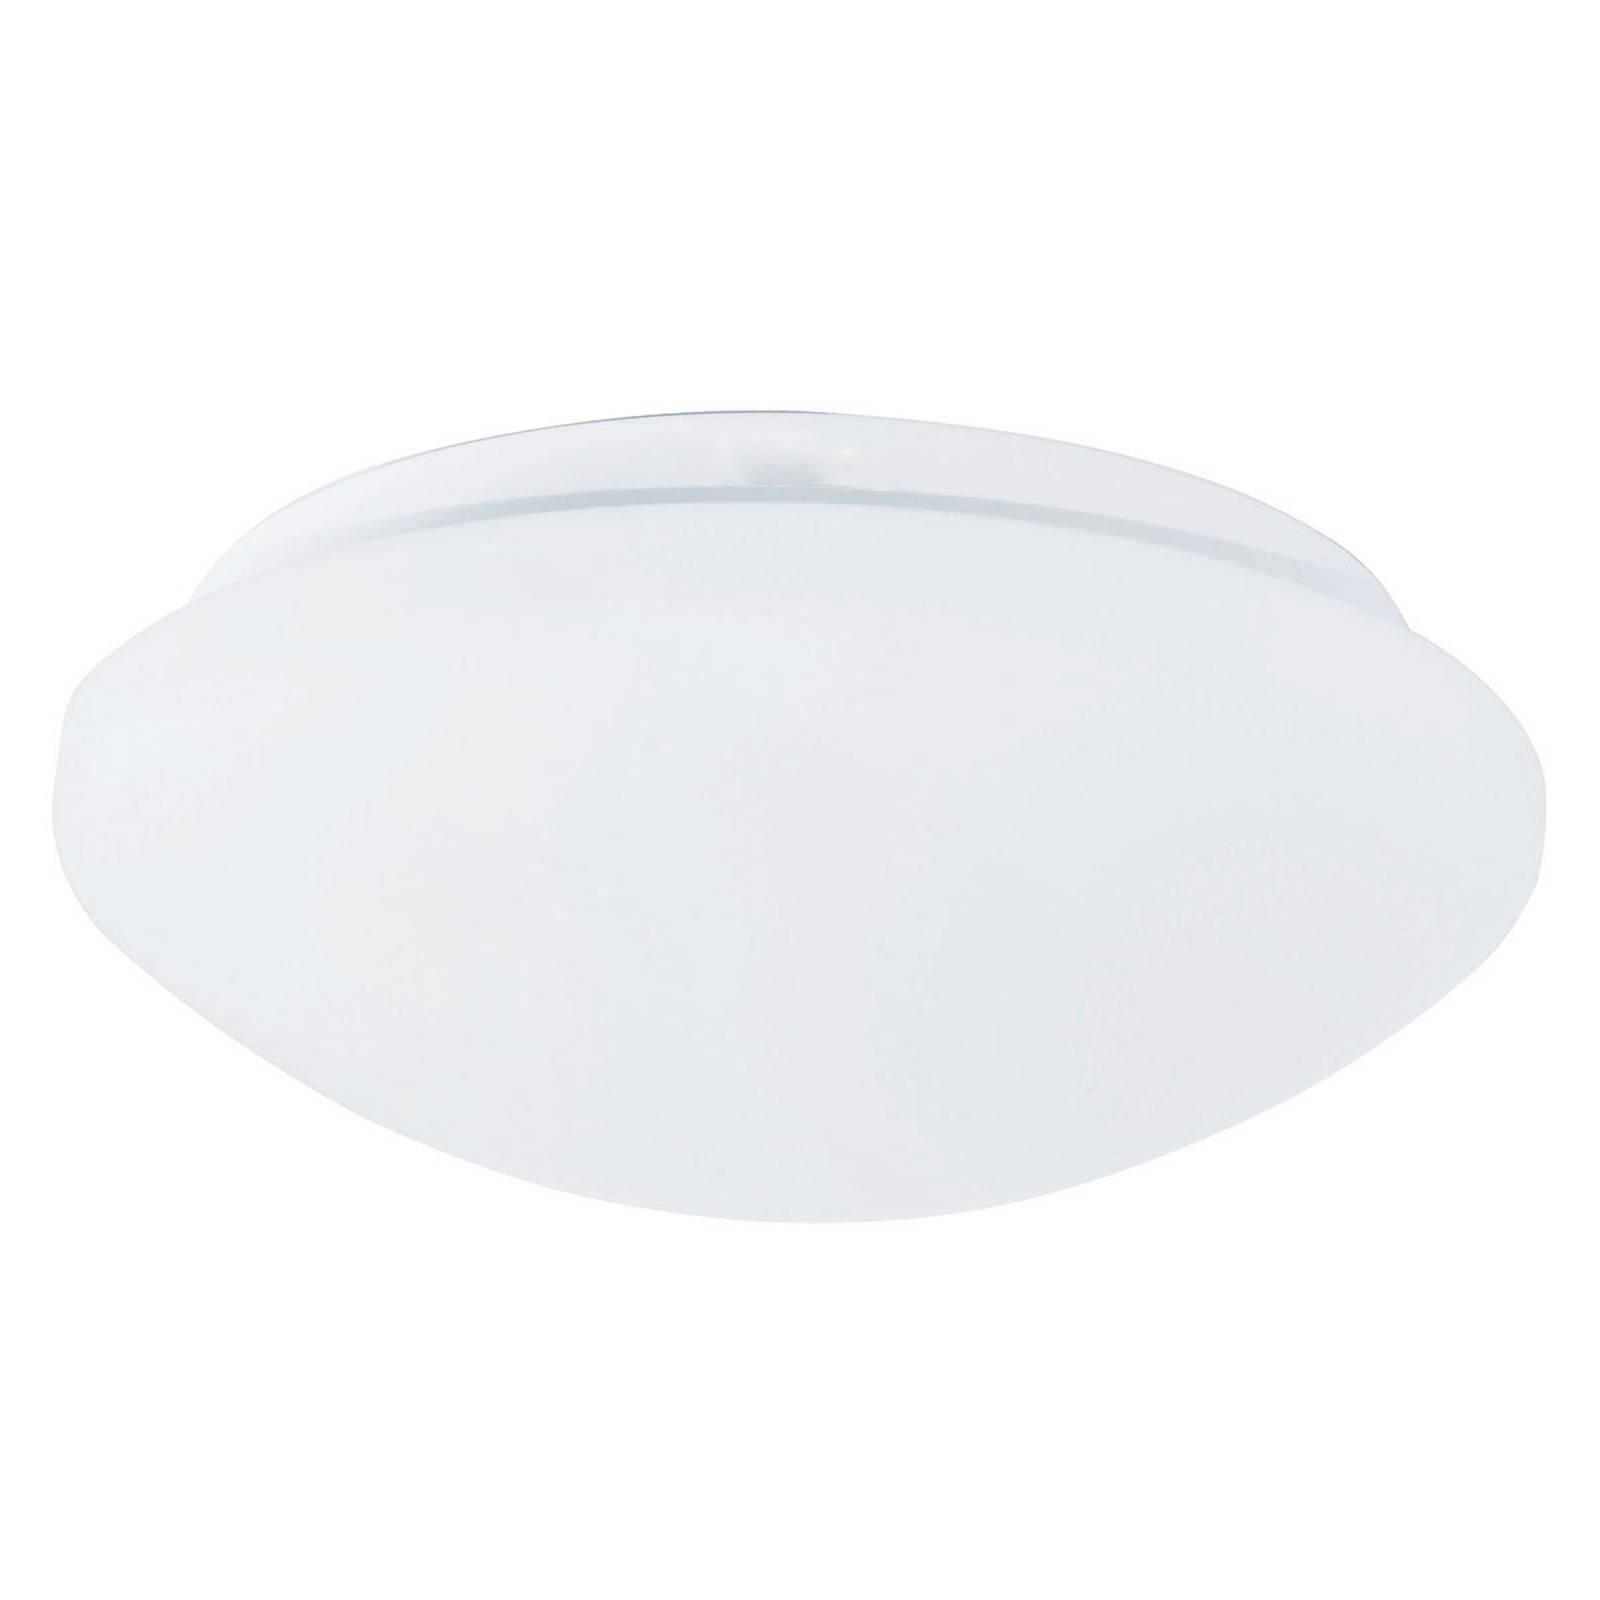 Kattovalaisin tunnistimella LED-DLMW1828cw